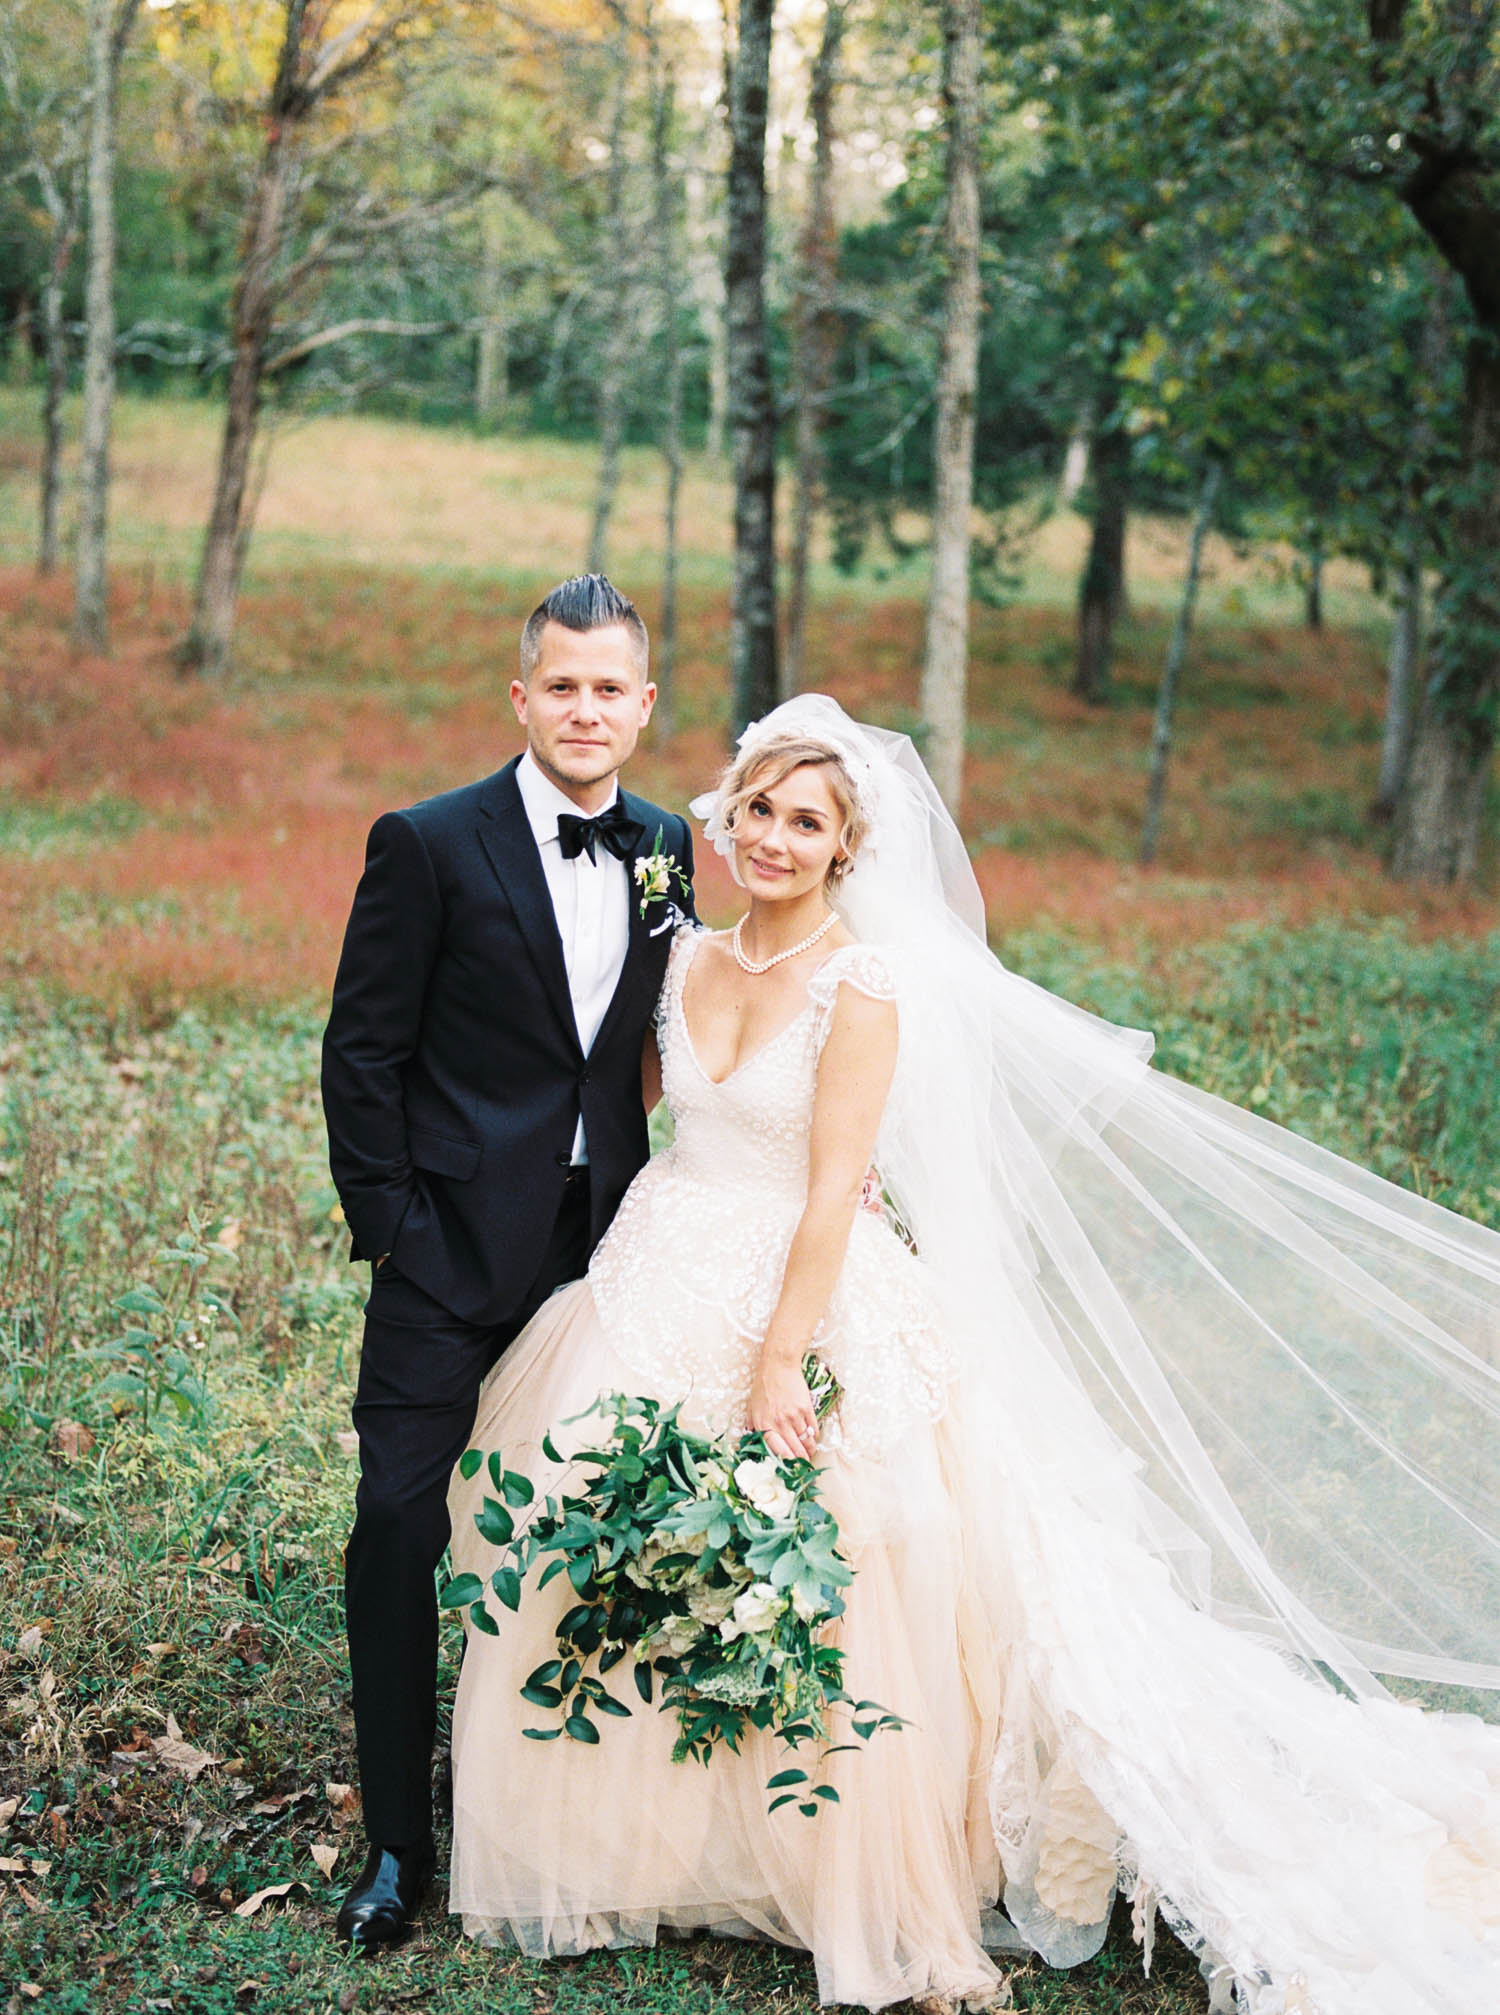 Blush wedding dress with asymmetrical, trailing floral design in Nashville, TN.